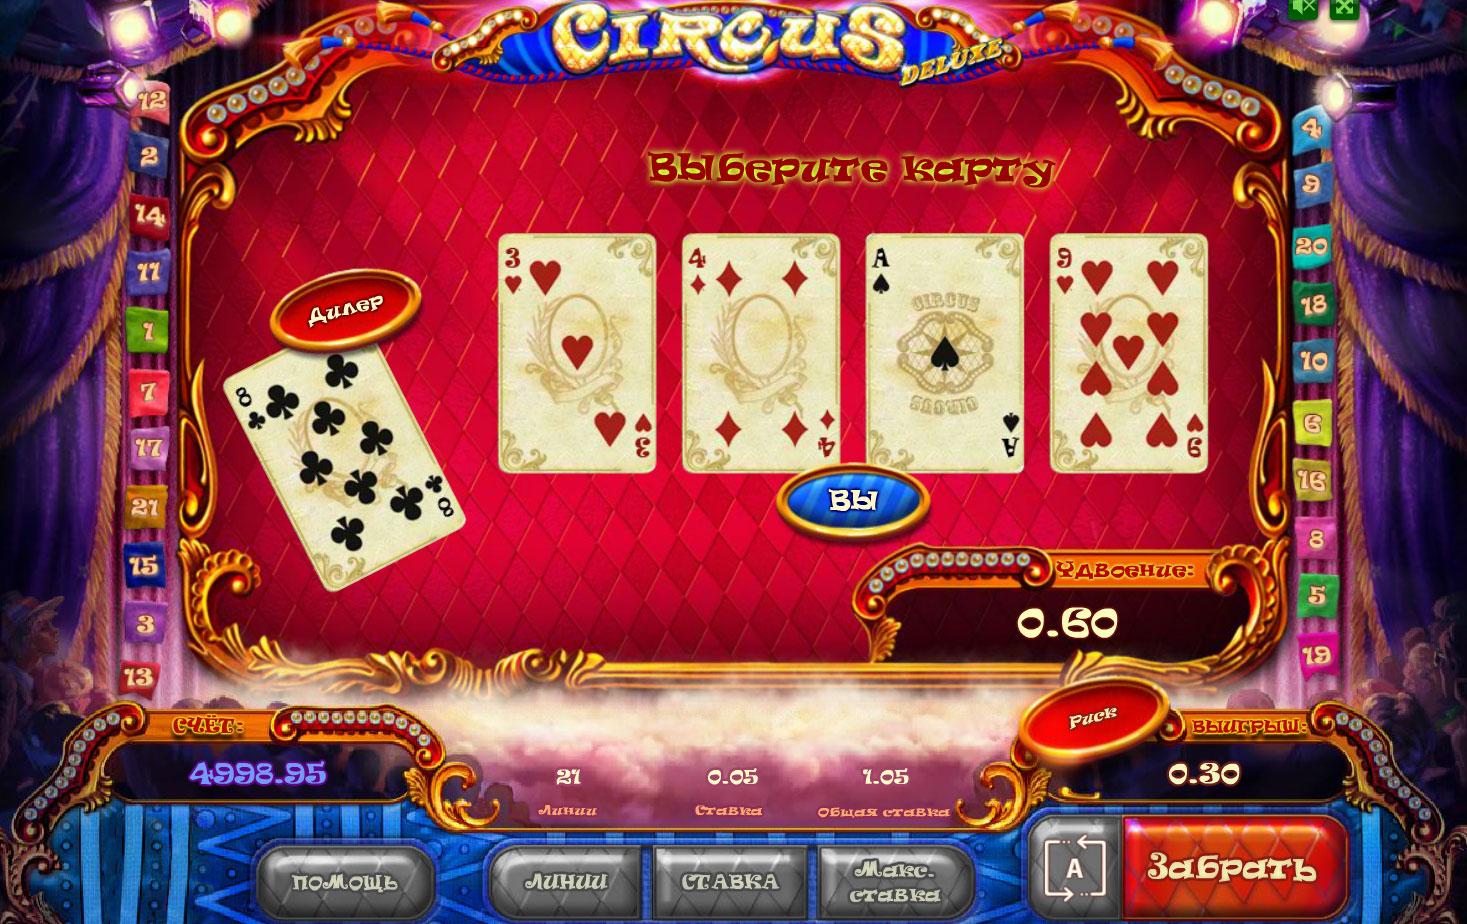 Риск игра в Цирке